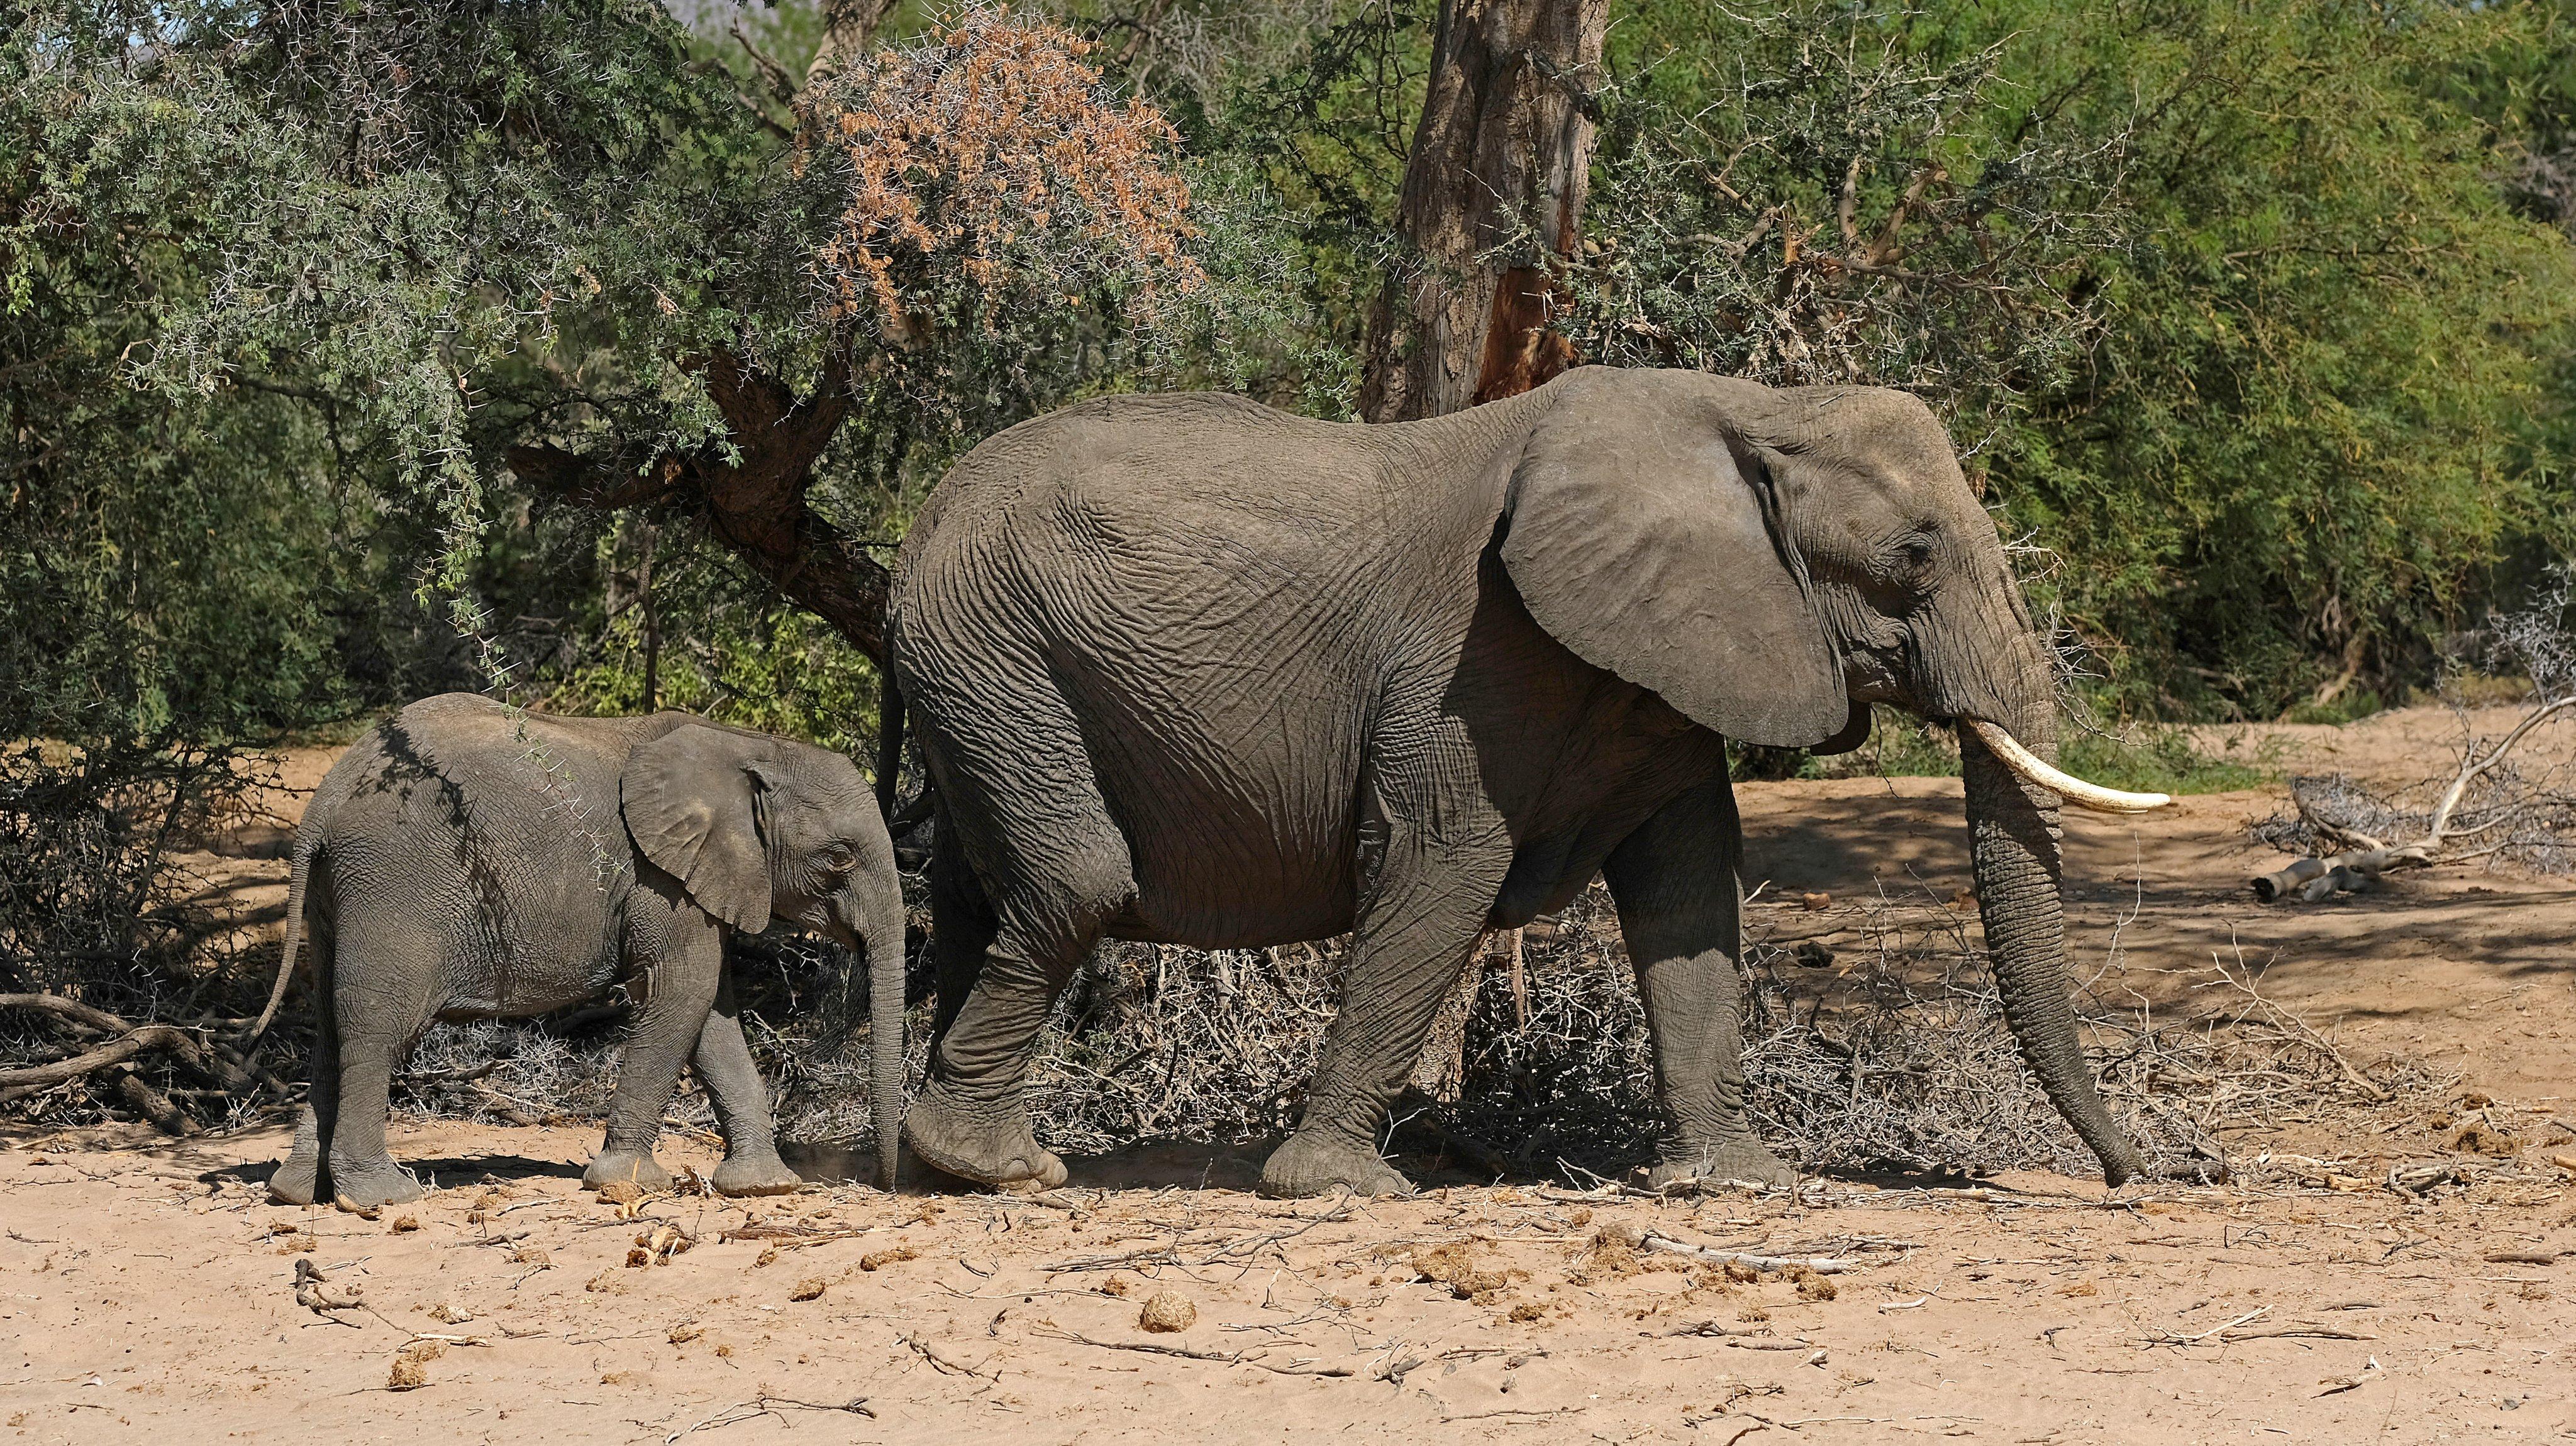 Desert elephants at Twyfelfontein